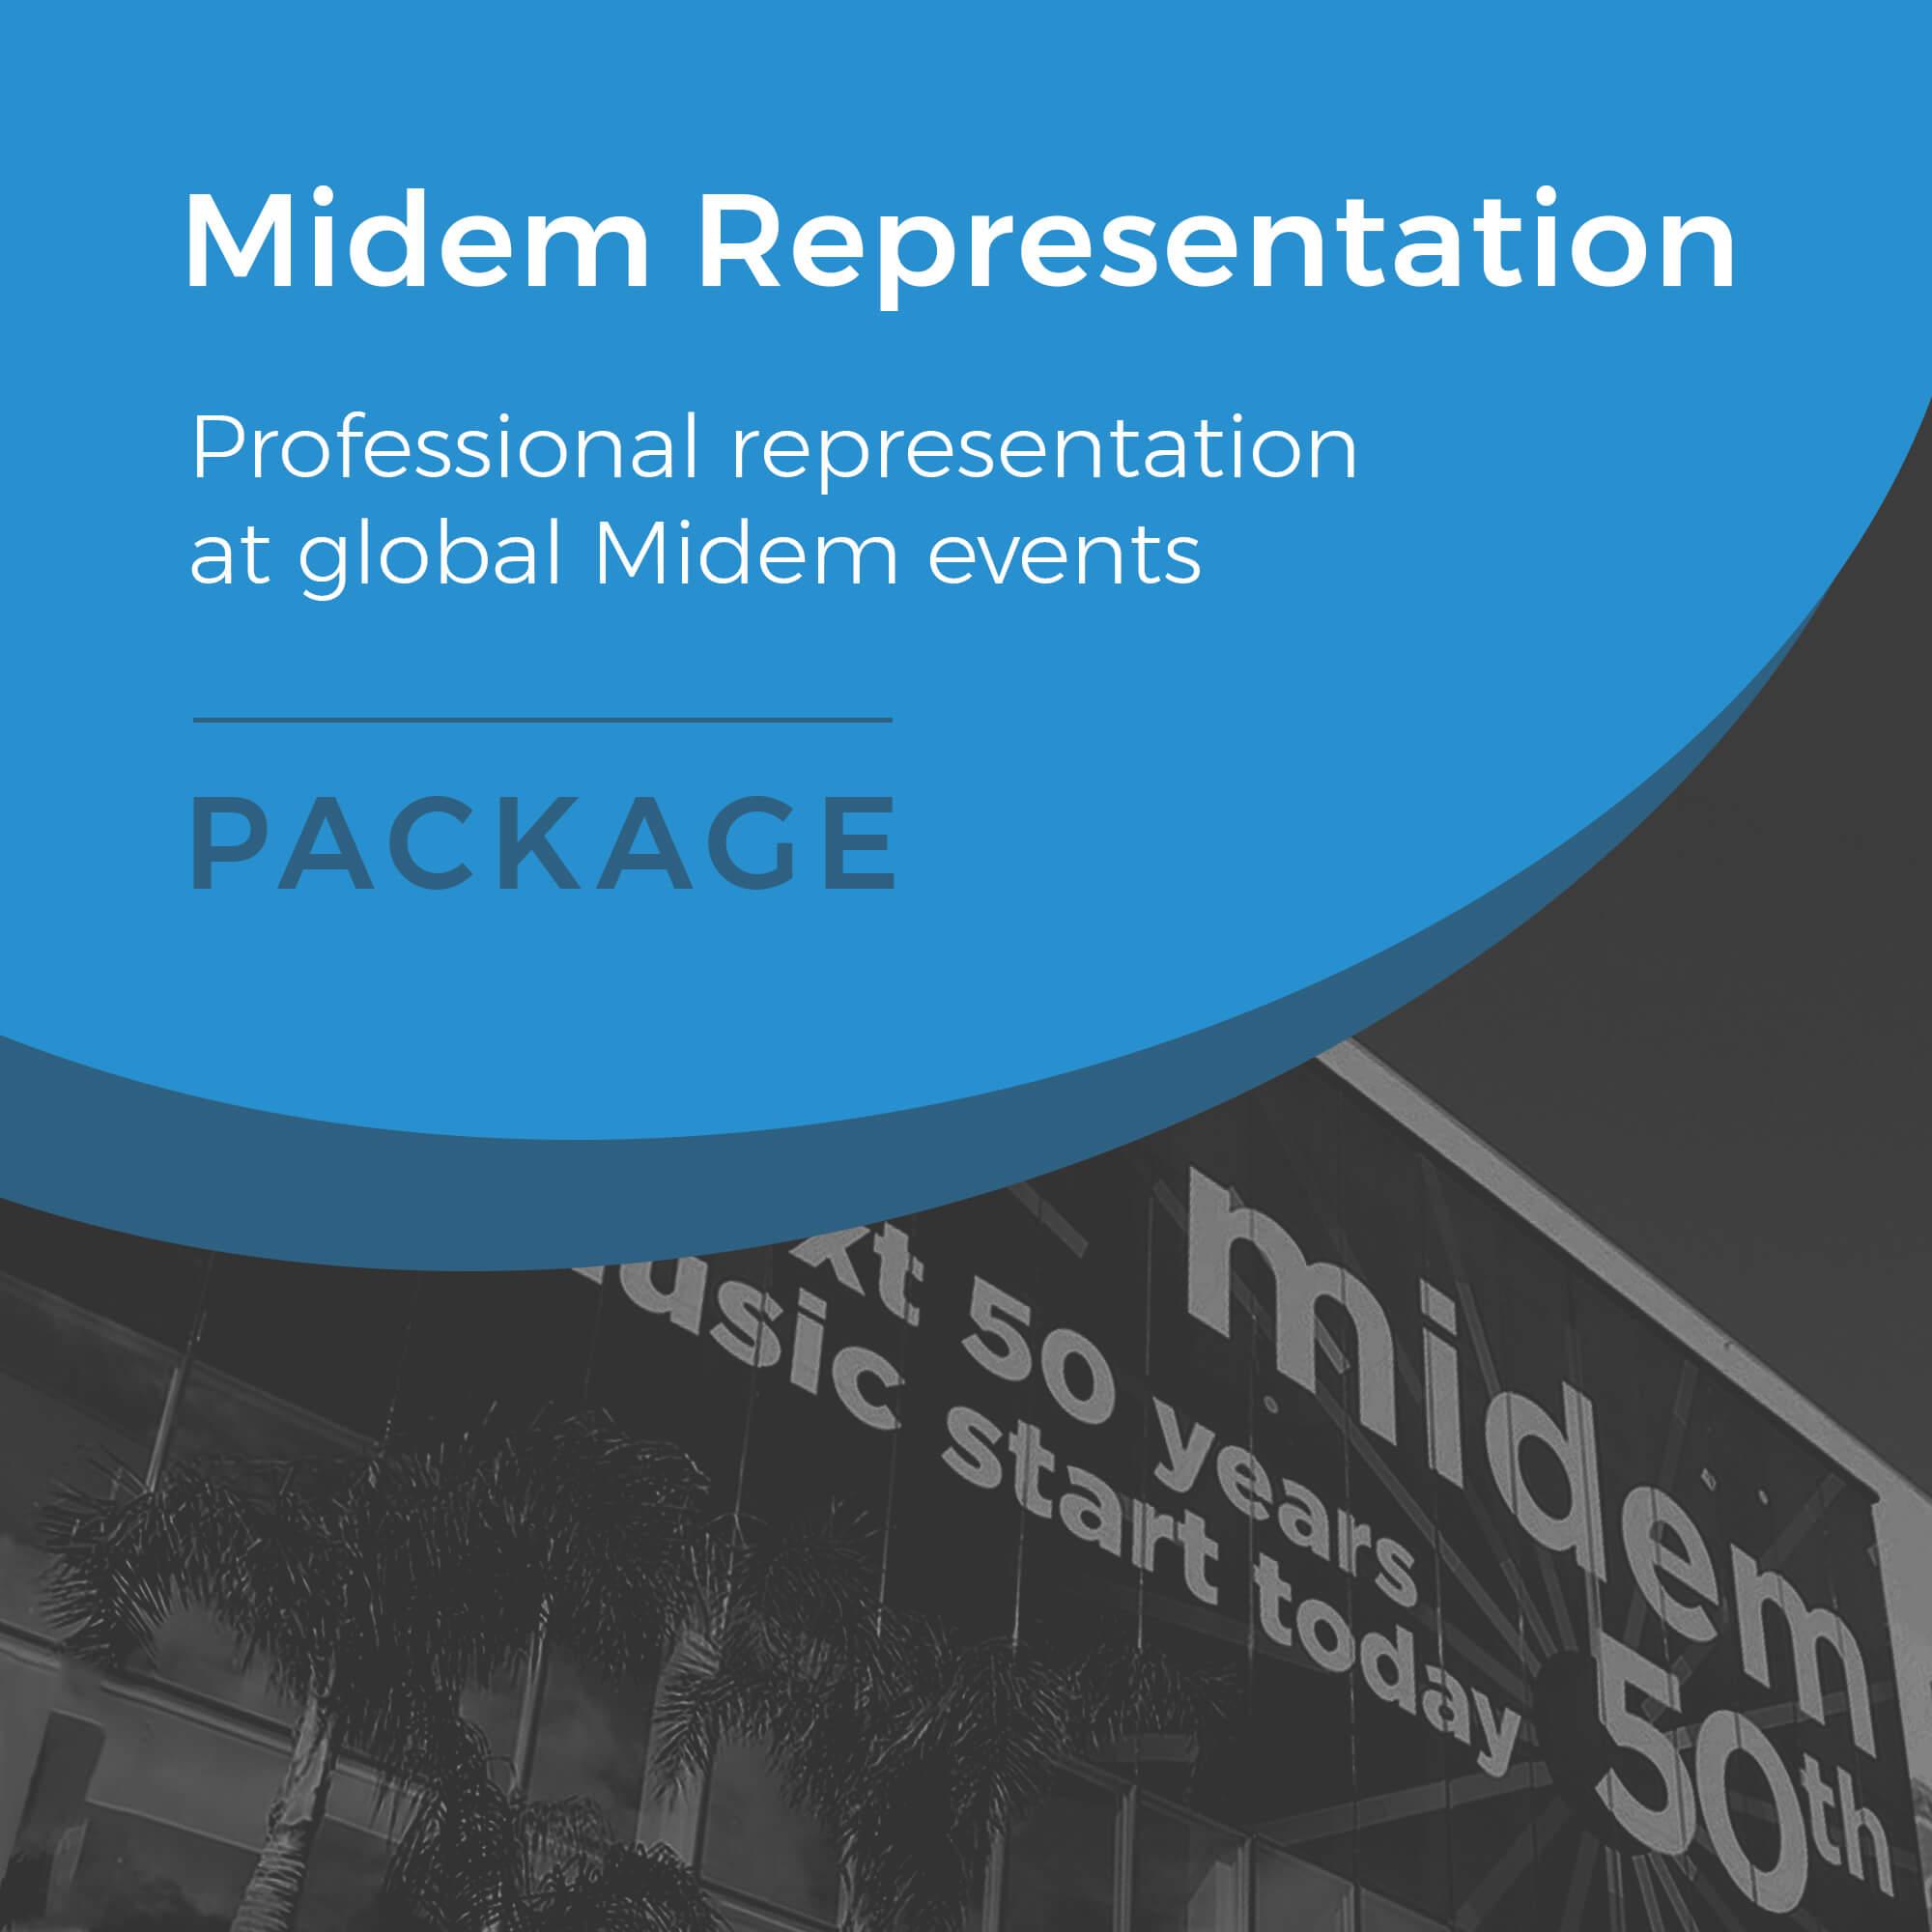 Midem Representation